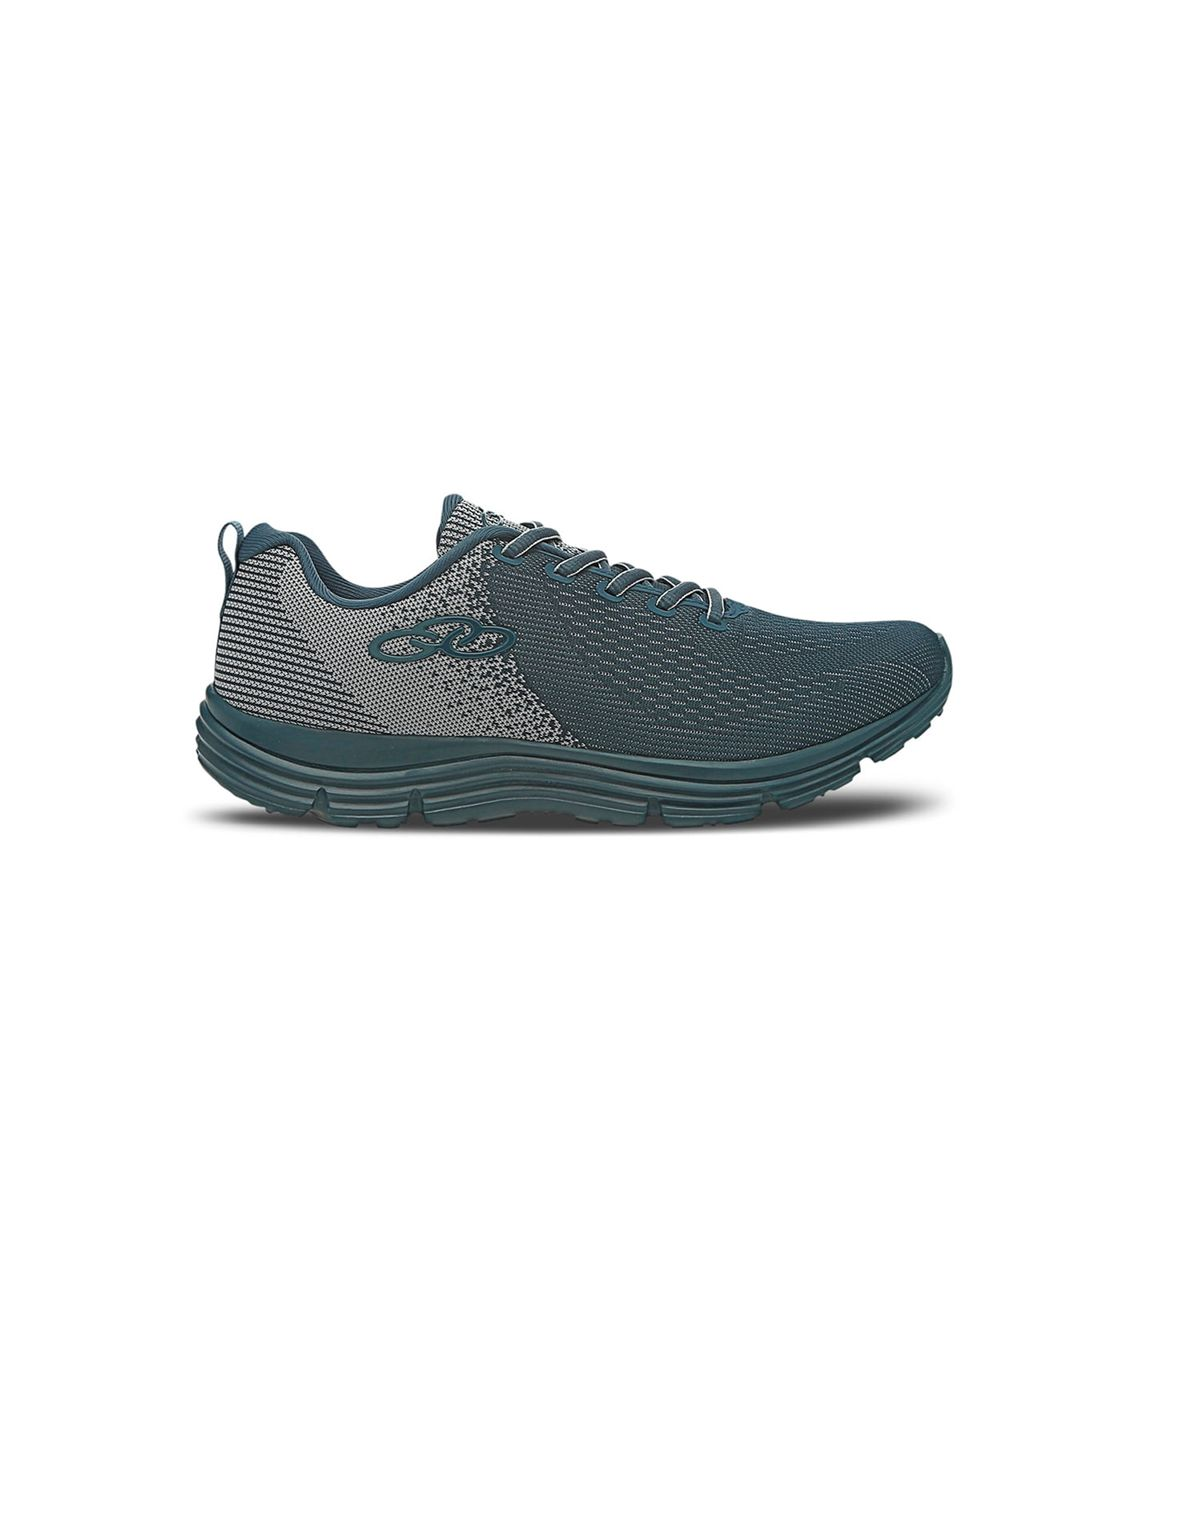 508164011-tenis-masculino-esportivo-olympikus-index-petroleo-cinza-41-9cd